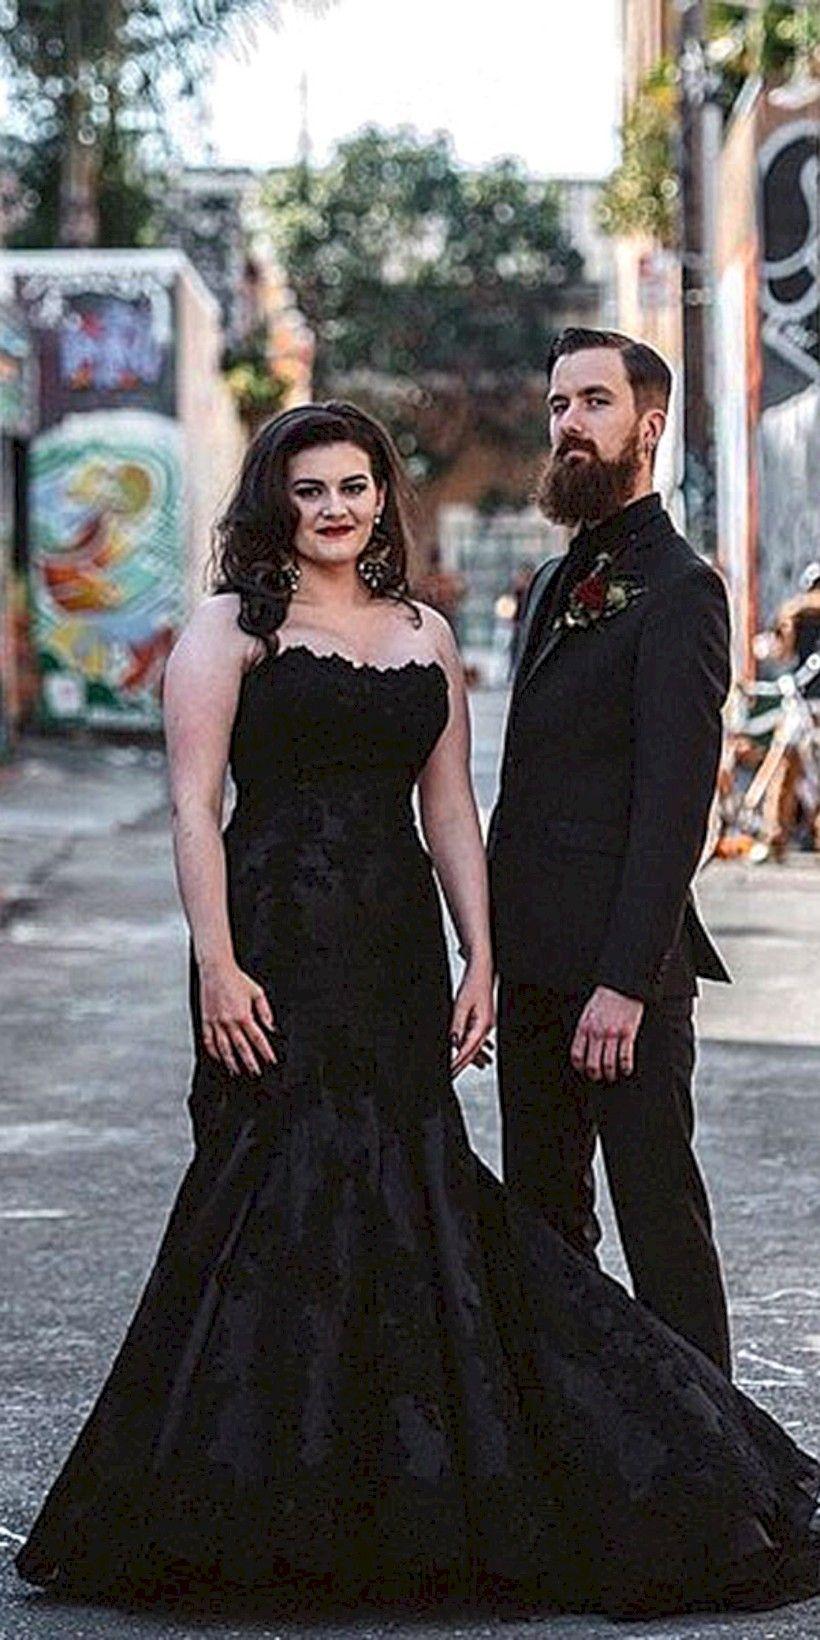 Cool 69 Adorable Black Halloween Wedding Dress Ideas Sviscawedding: Gothic Halloween Wedding Dress At Websimilar.org